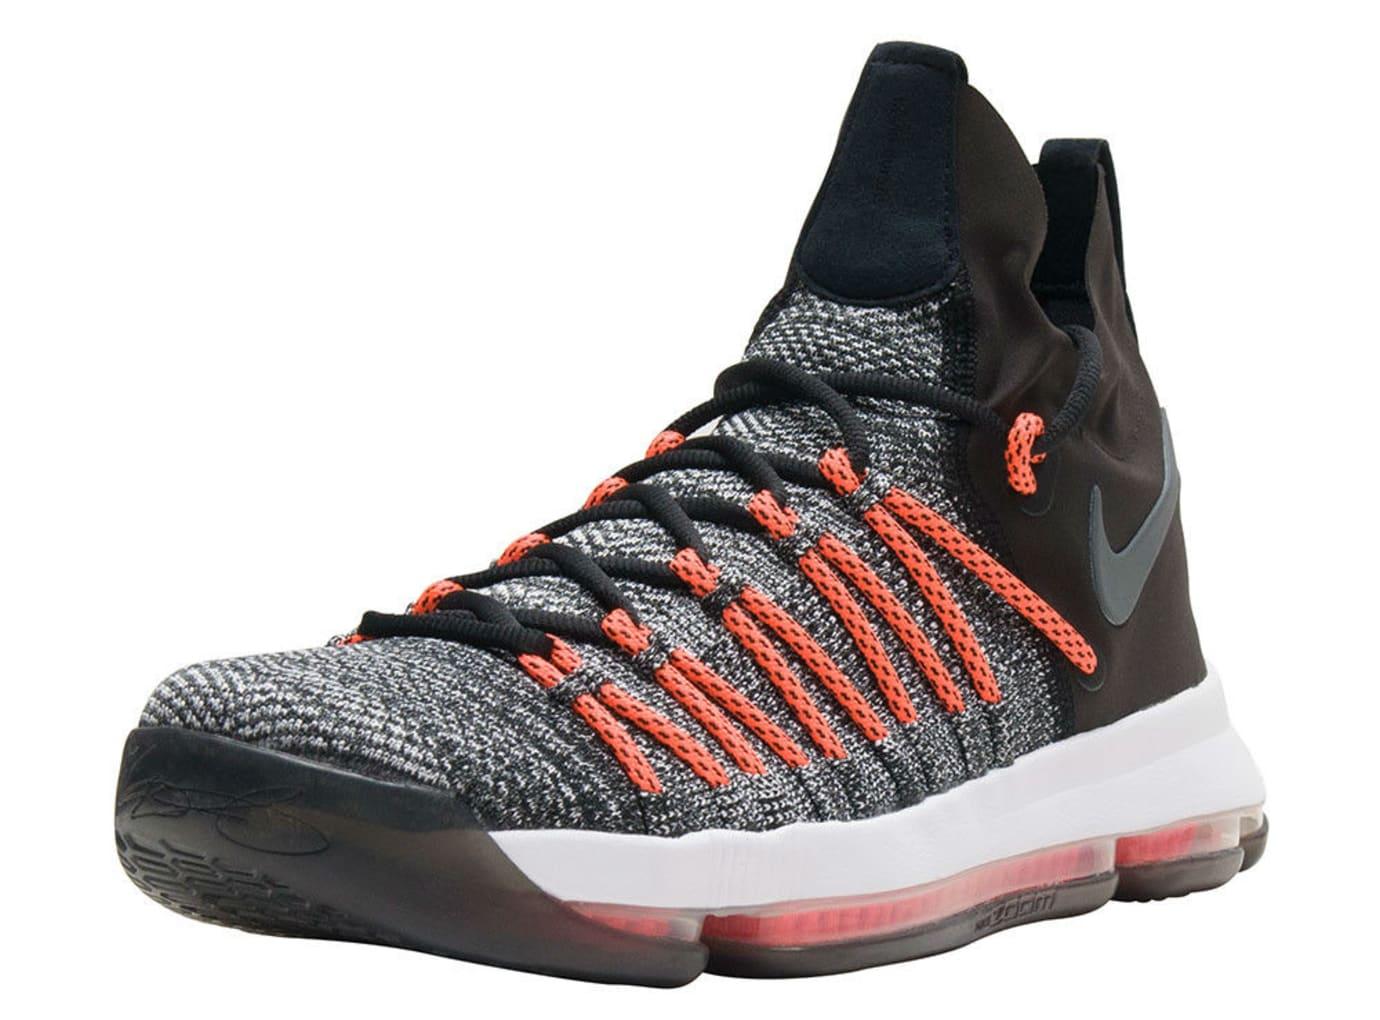 Nike KD 9 Elite Black White Dark Grey Hyper Orange Release Date Main 878637-010